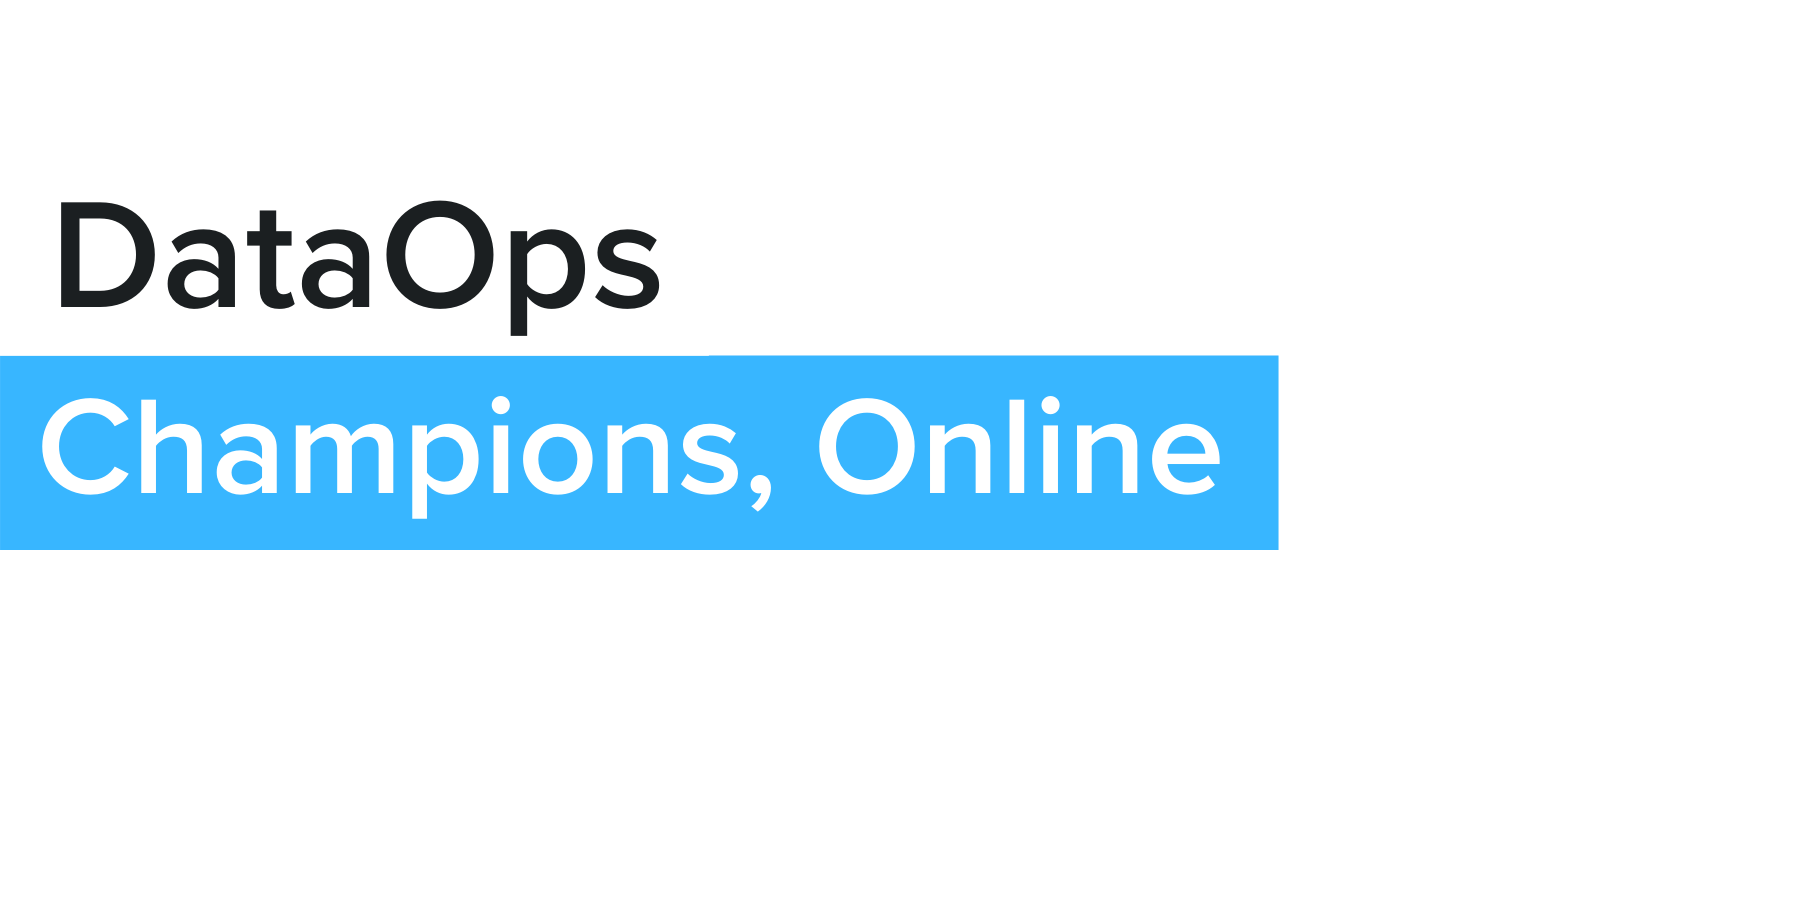 DataOps US - February 2 - 4, 2021